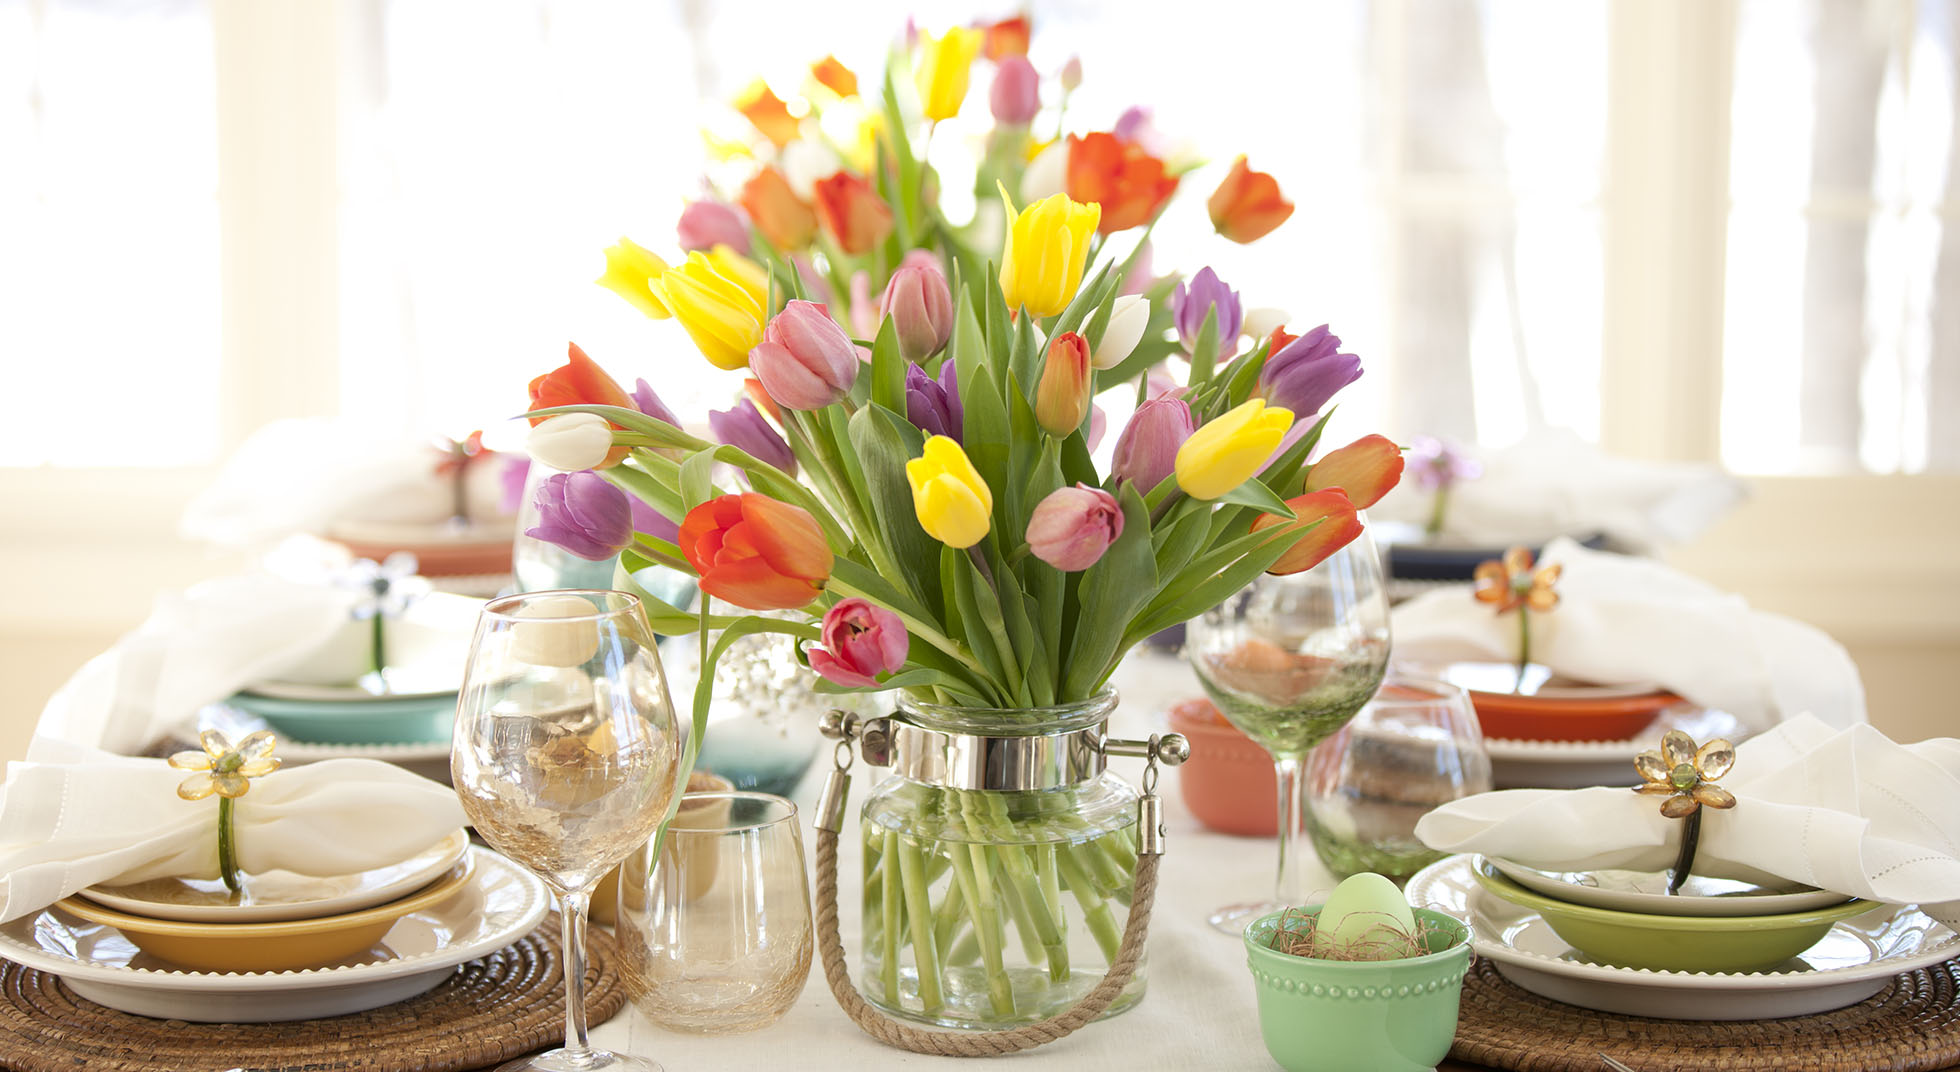 Tavola di primavera idee idee per la casa - Tavola di primavera idee ...